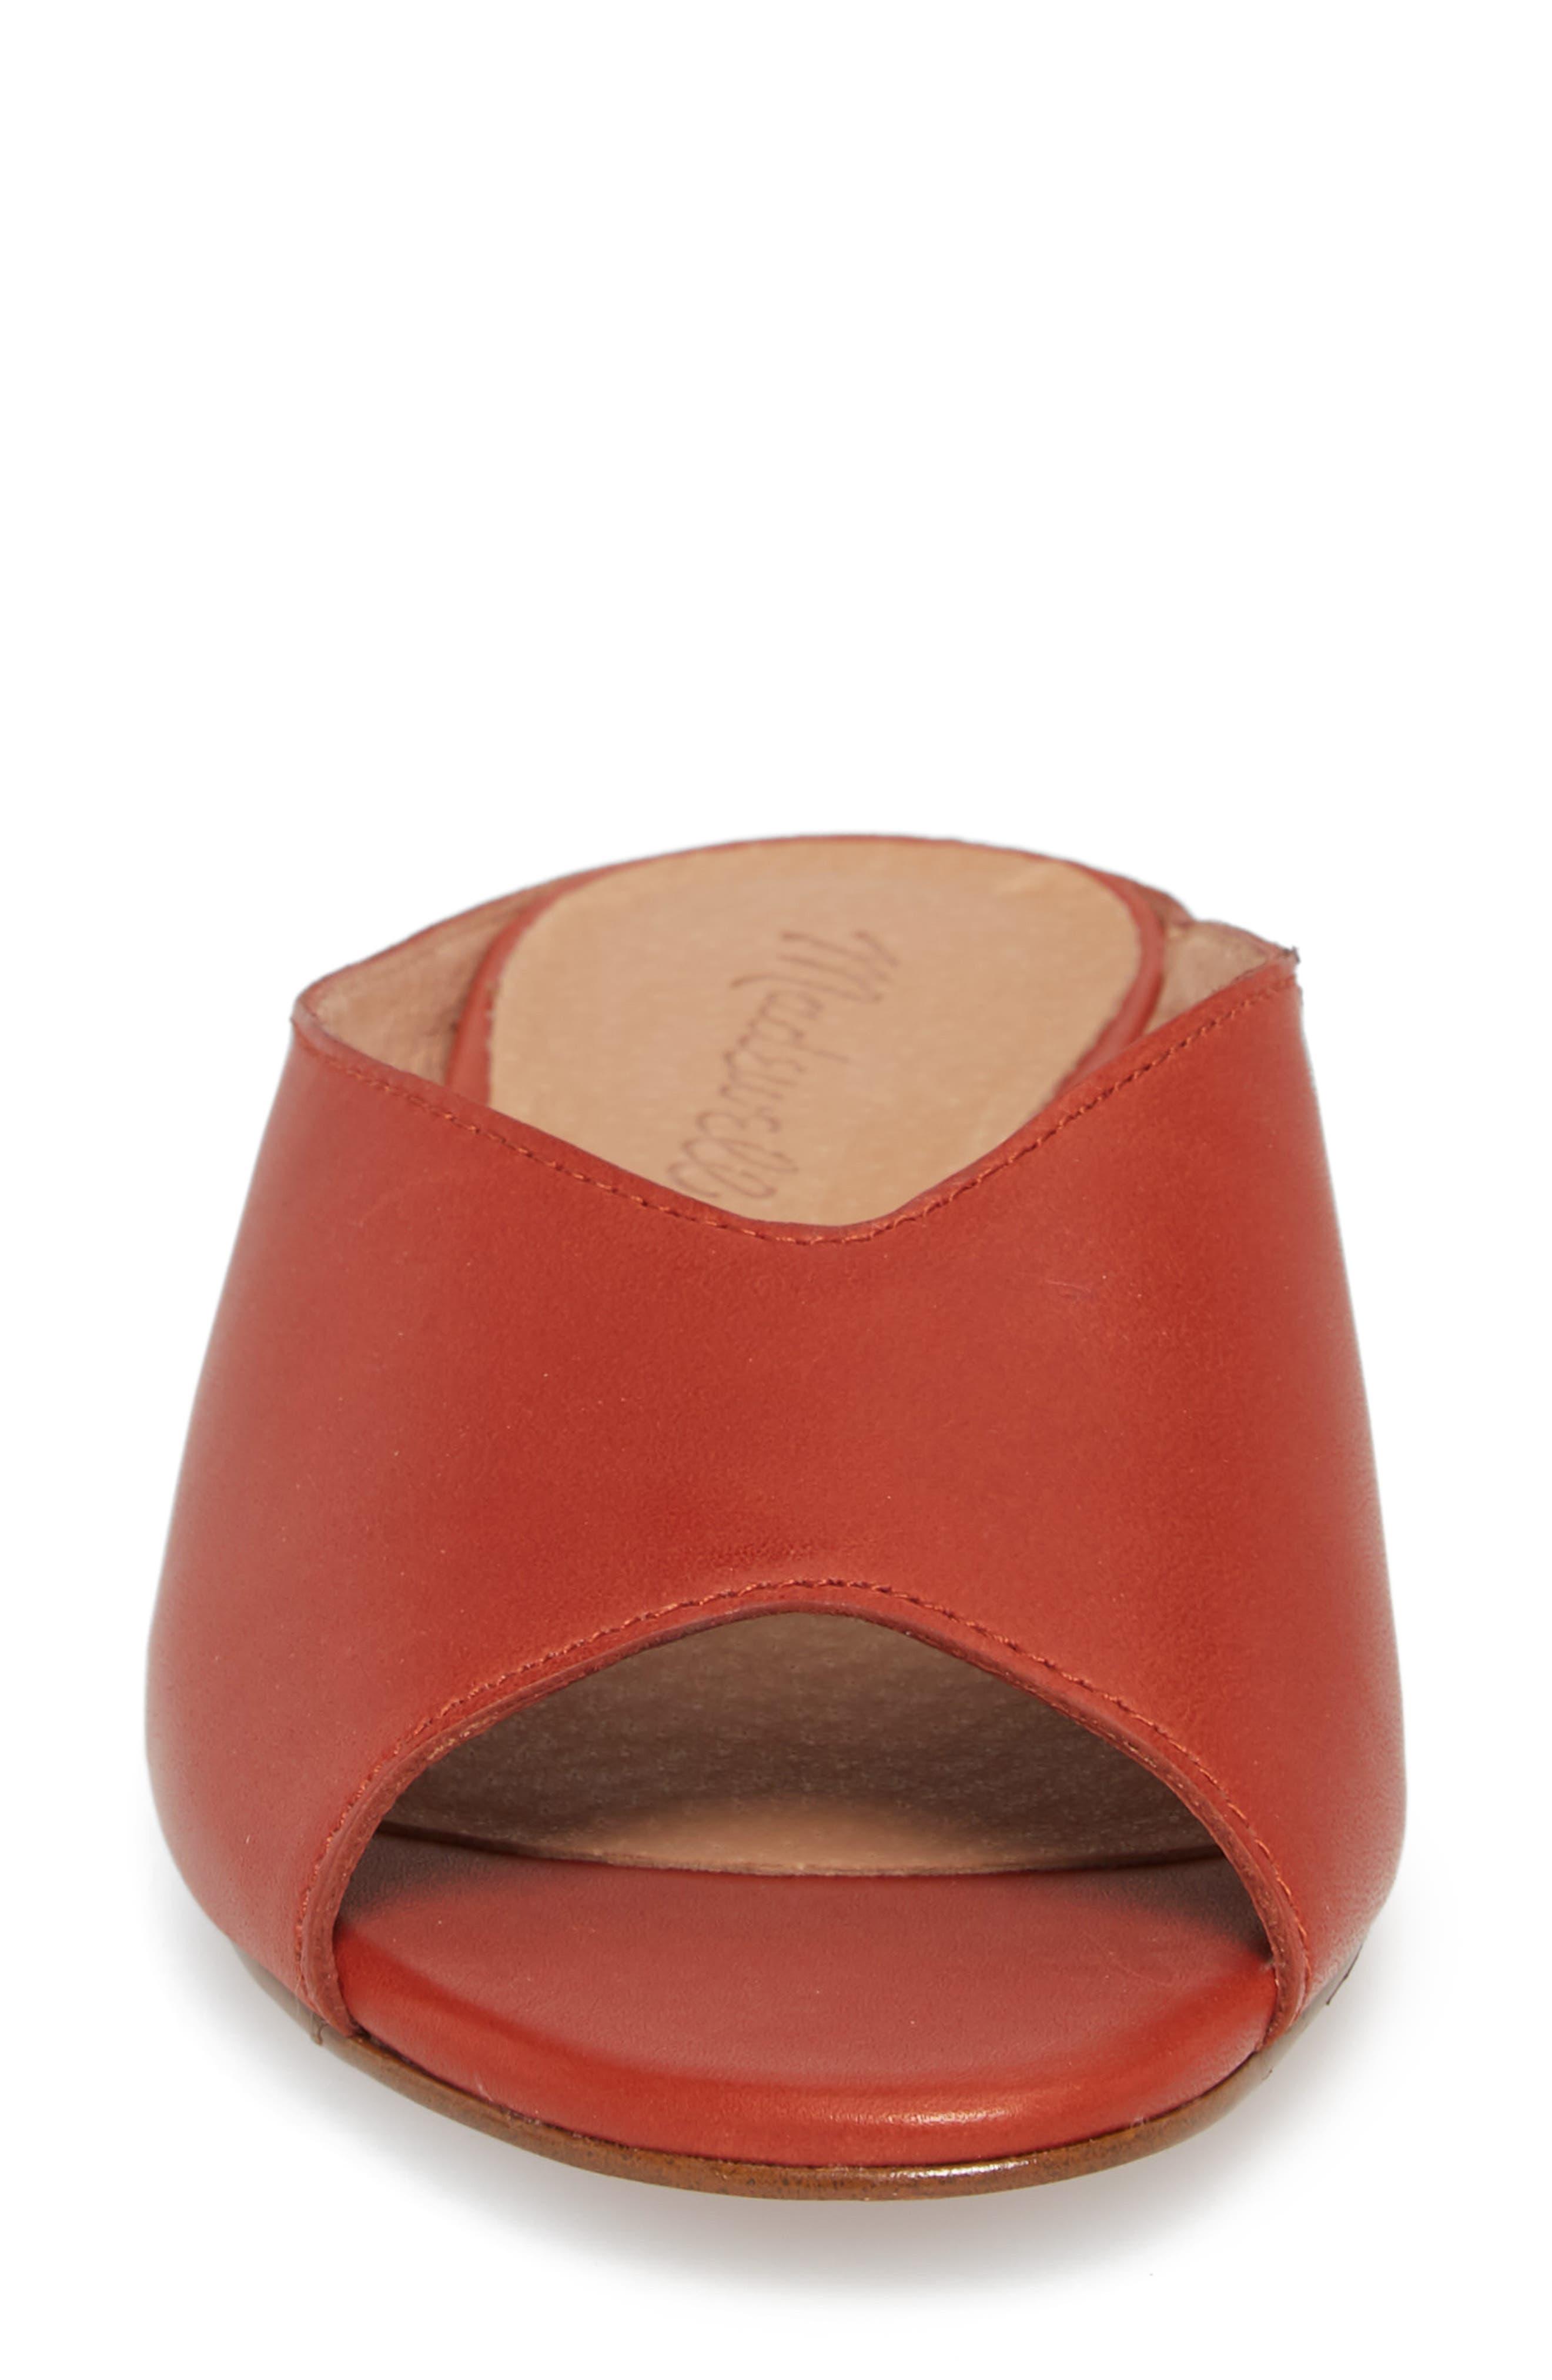 Tavi Slide Sandal,                             Alternate thumbnail 4, color,                             Dark Cinnabar Leather